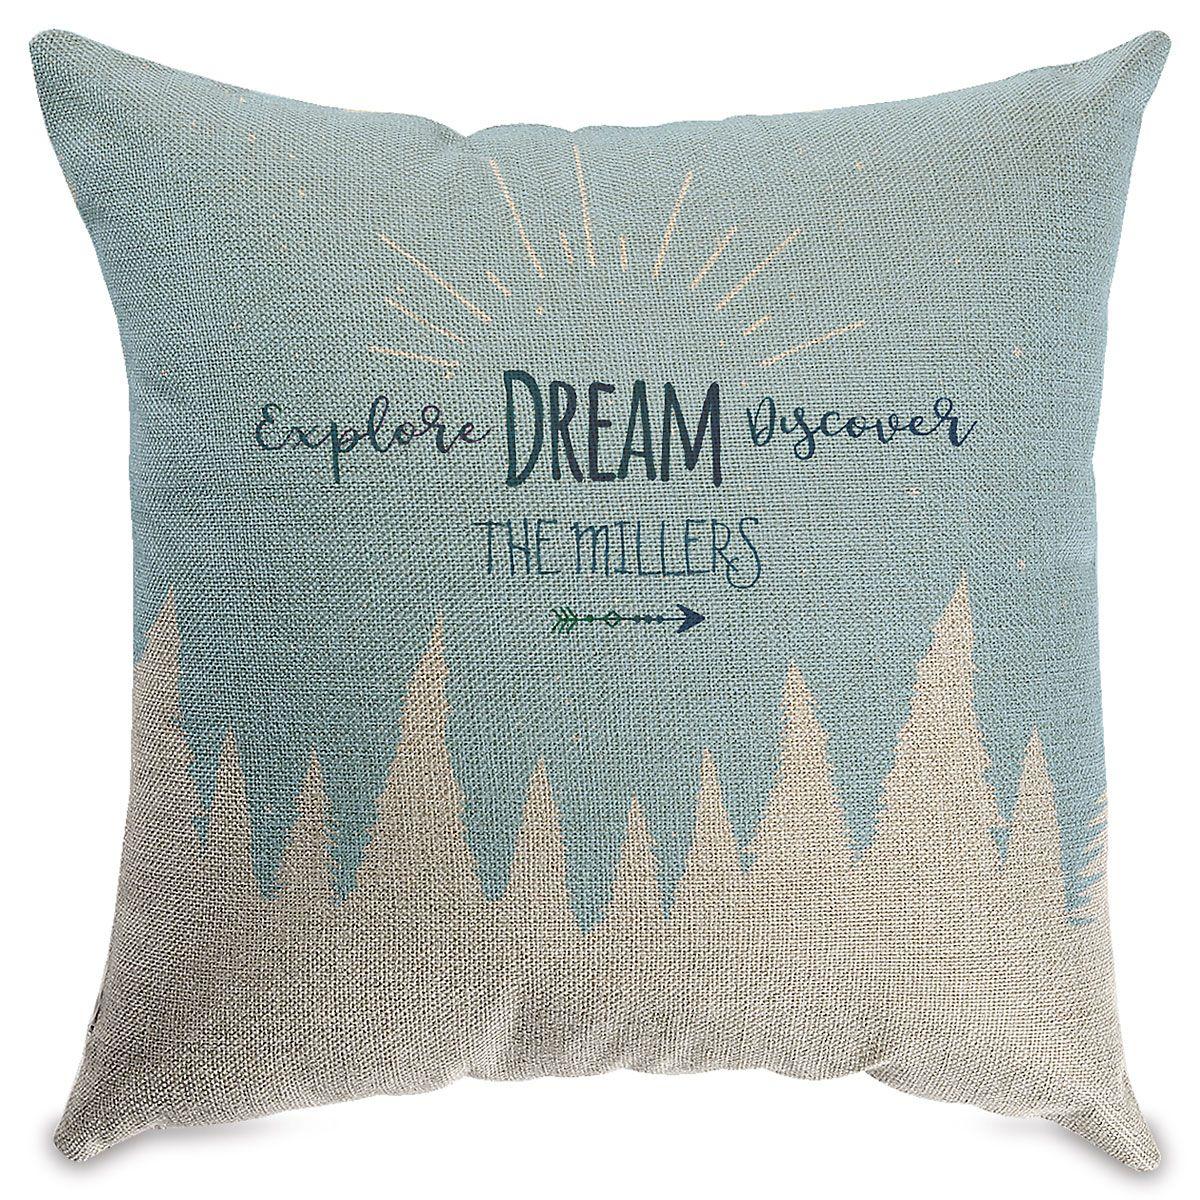 Explore Dream Customized Natural Pillow